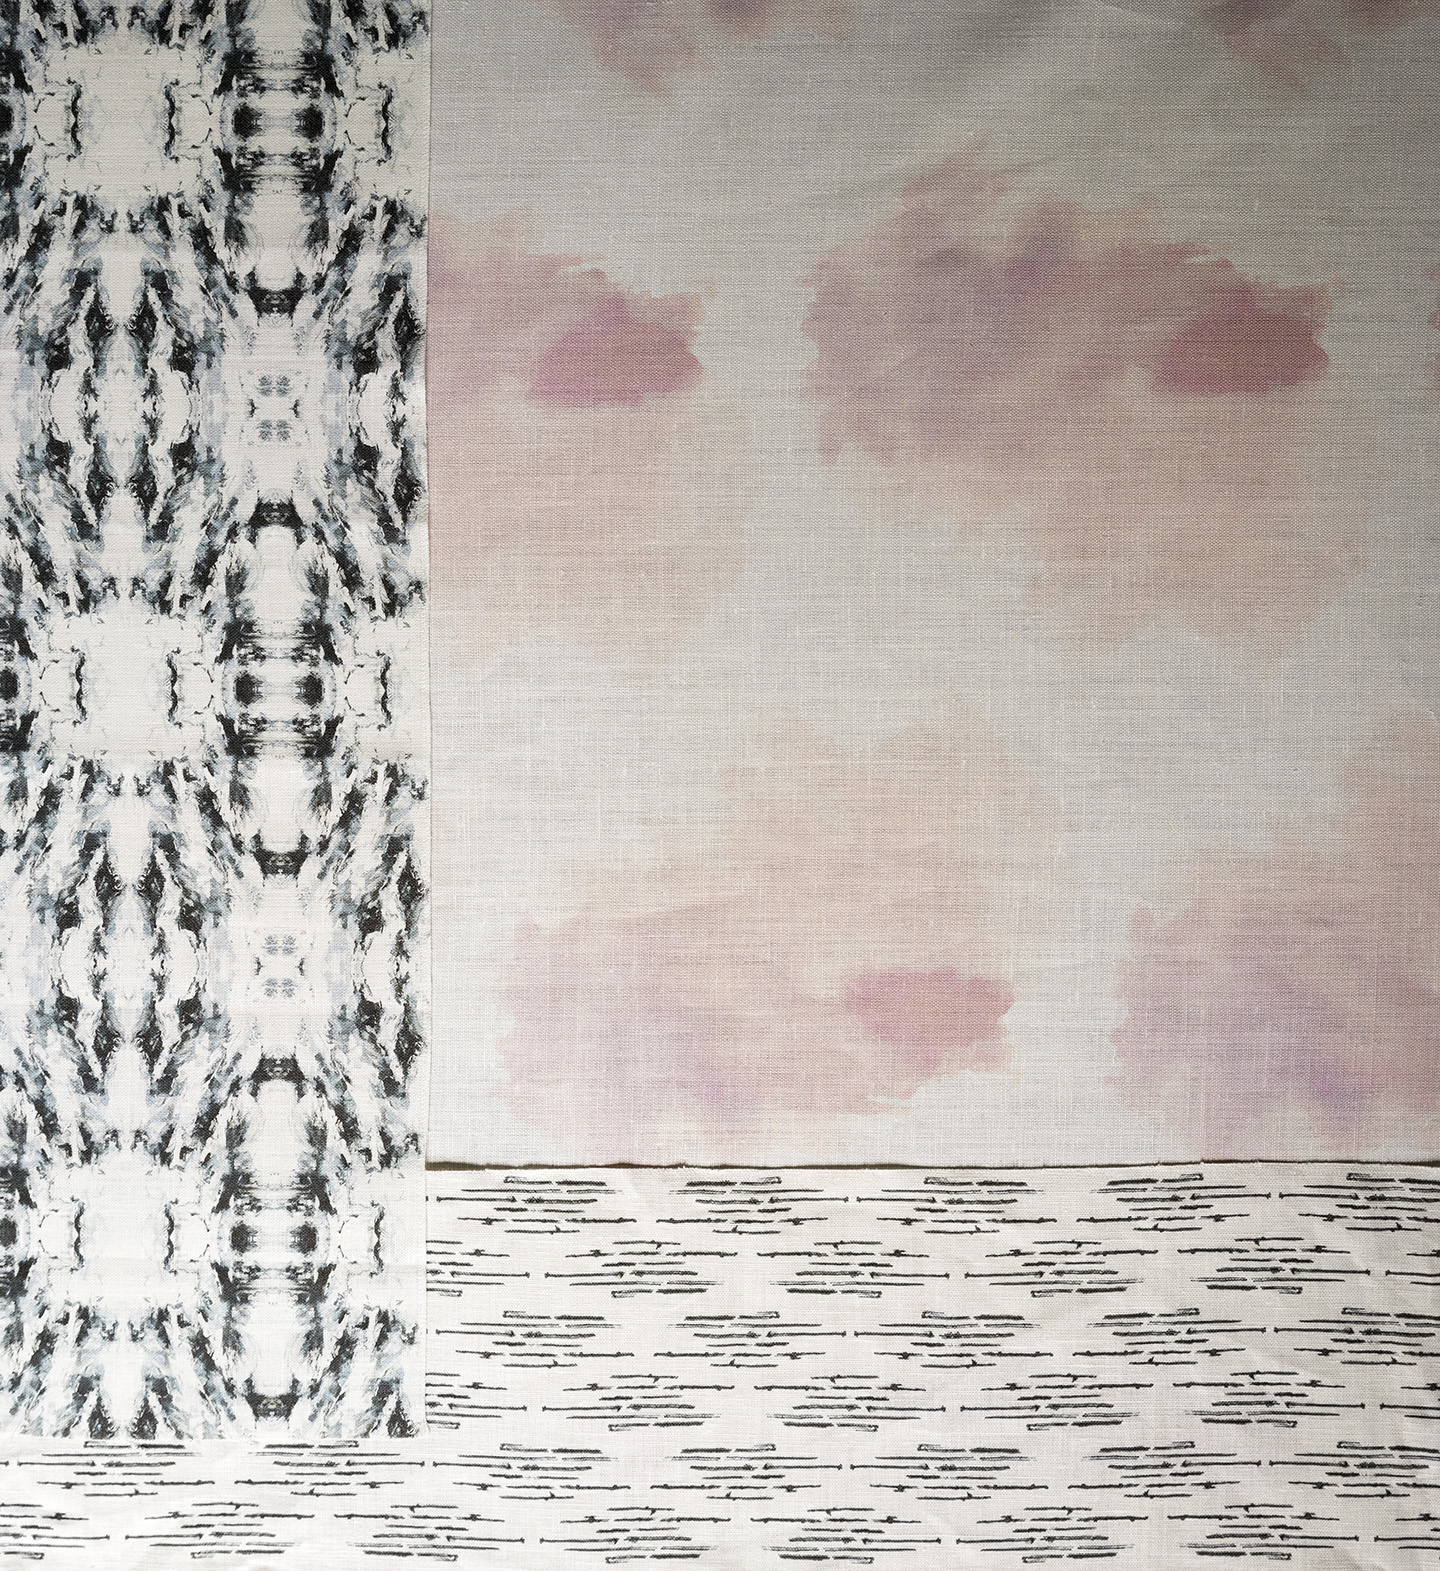 dirkse-textiles-198x_small.jpg